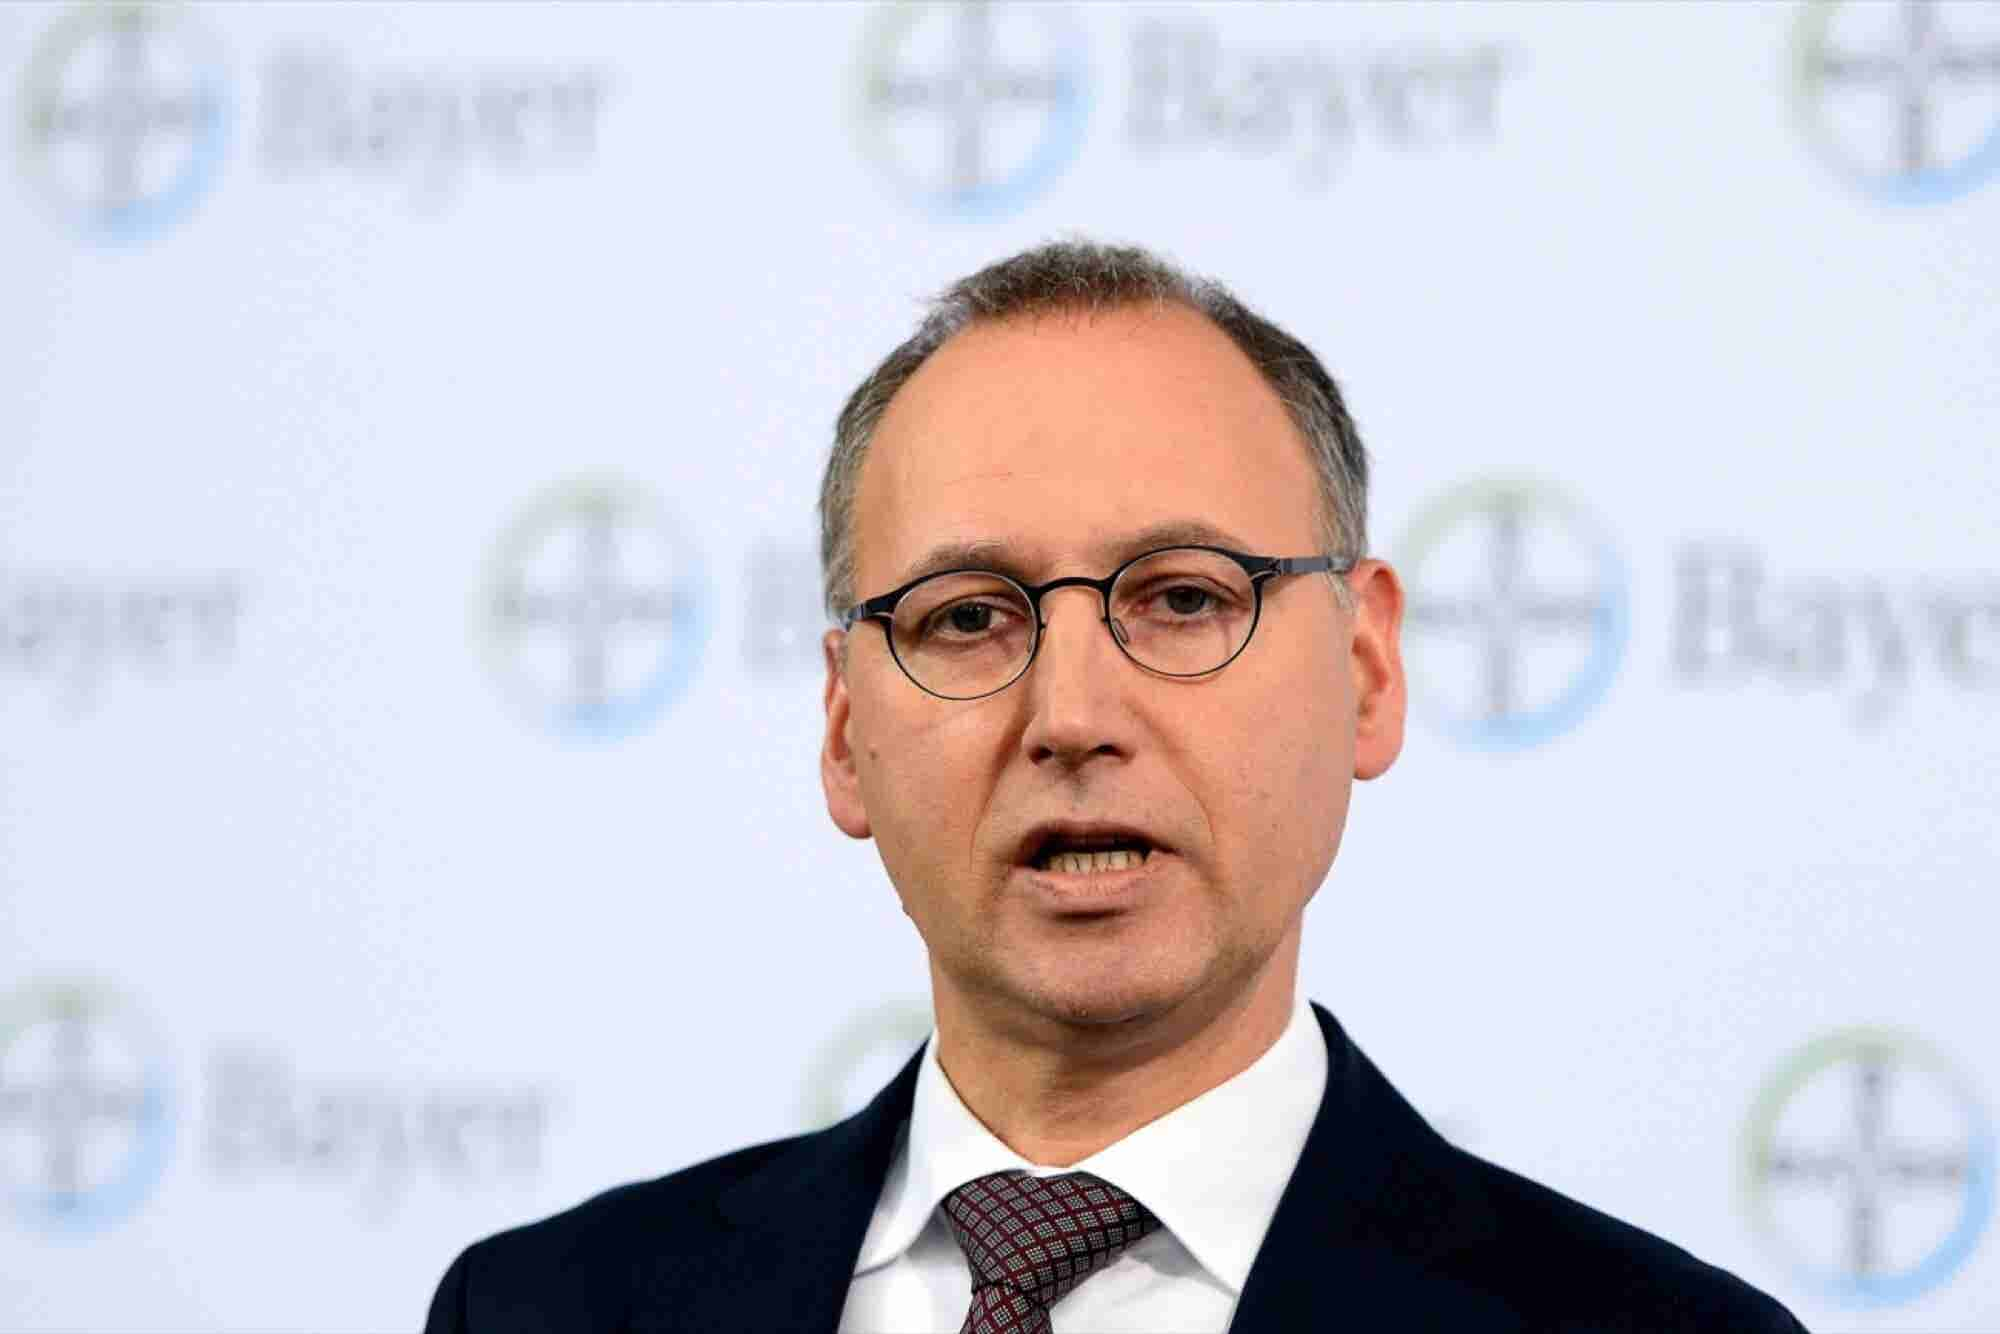 Bayer Defies Critics With $62 Billion Monsanto Offer